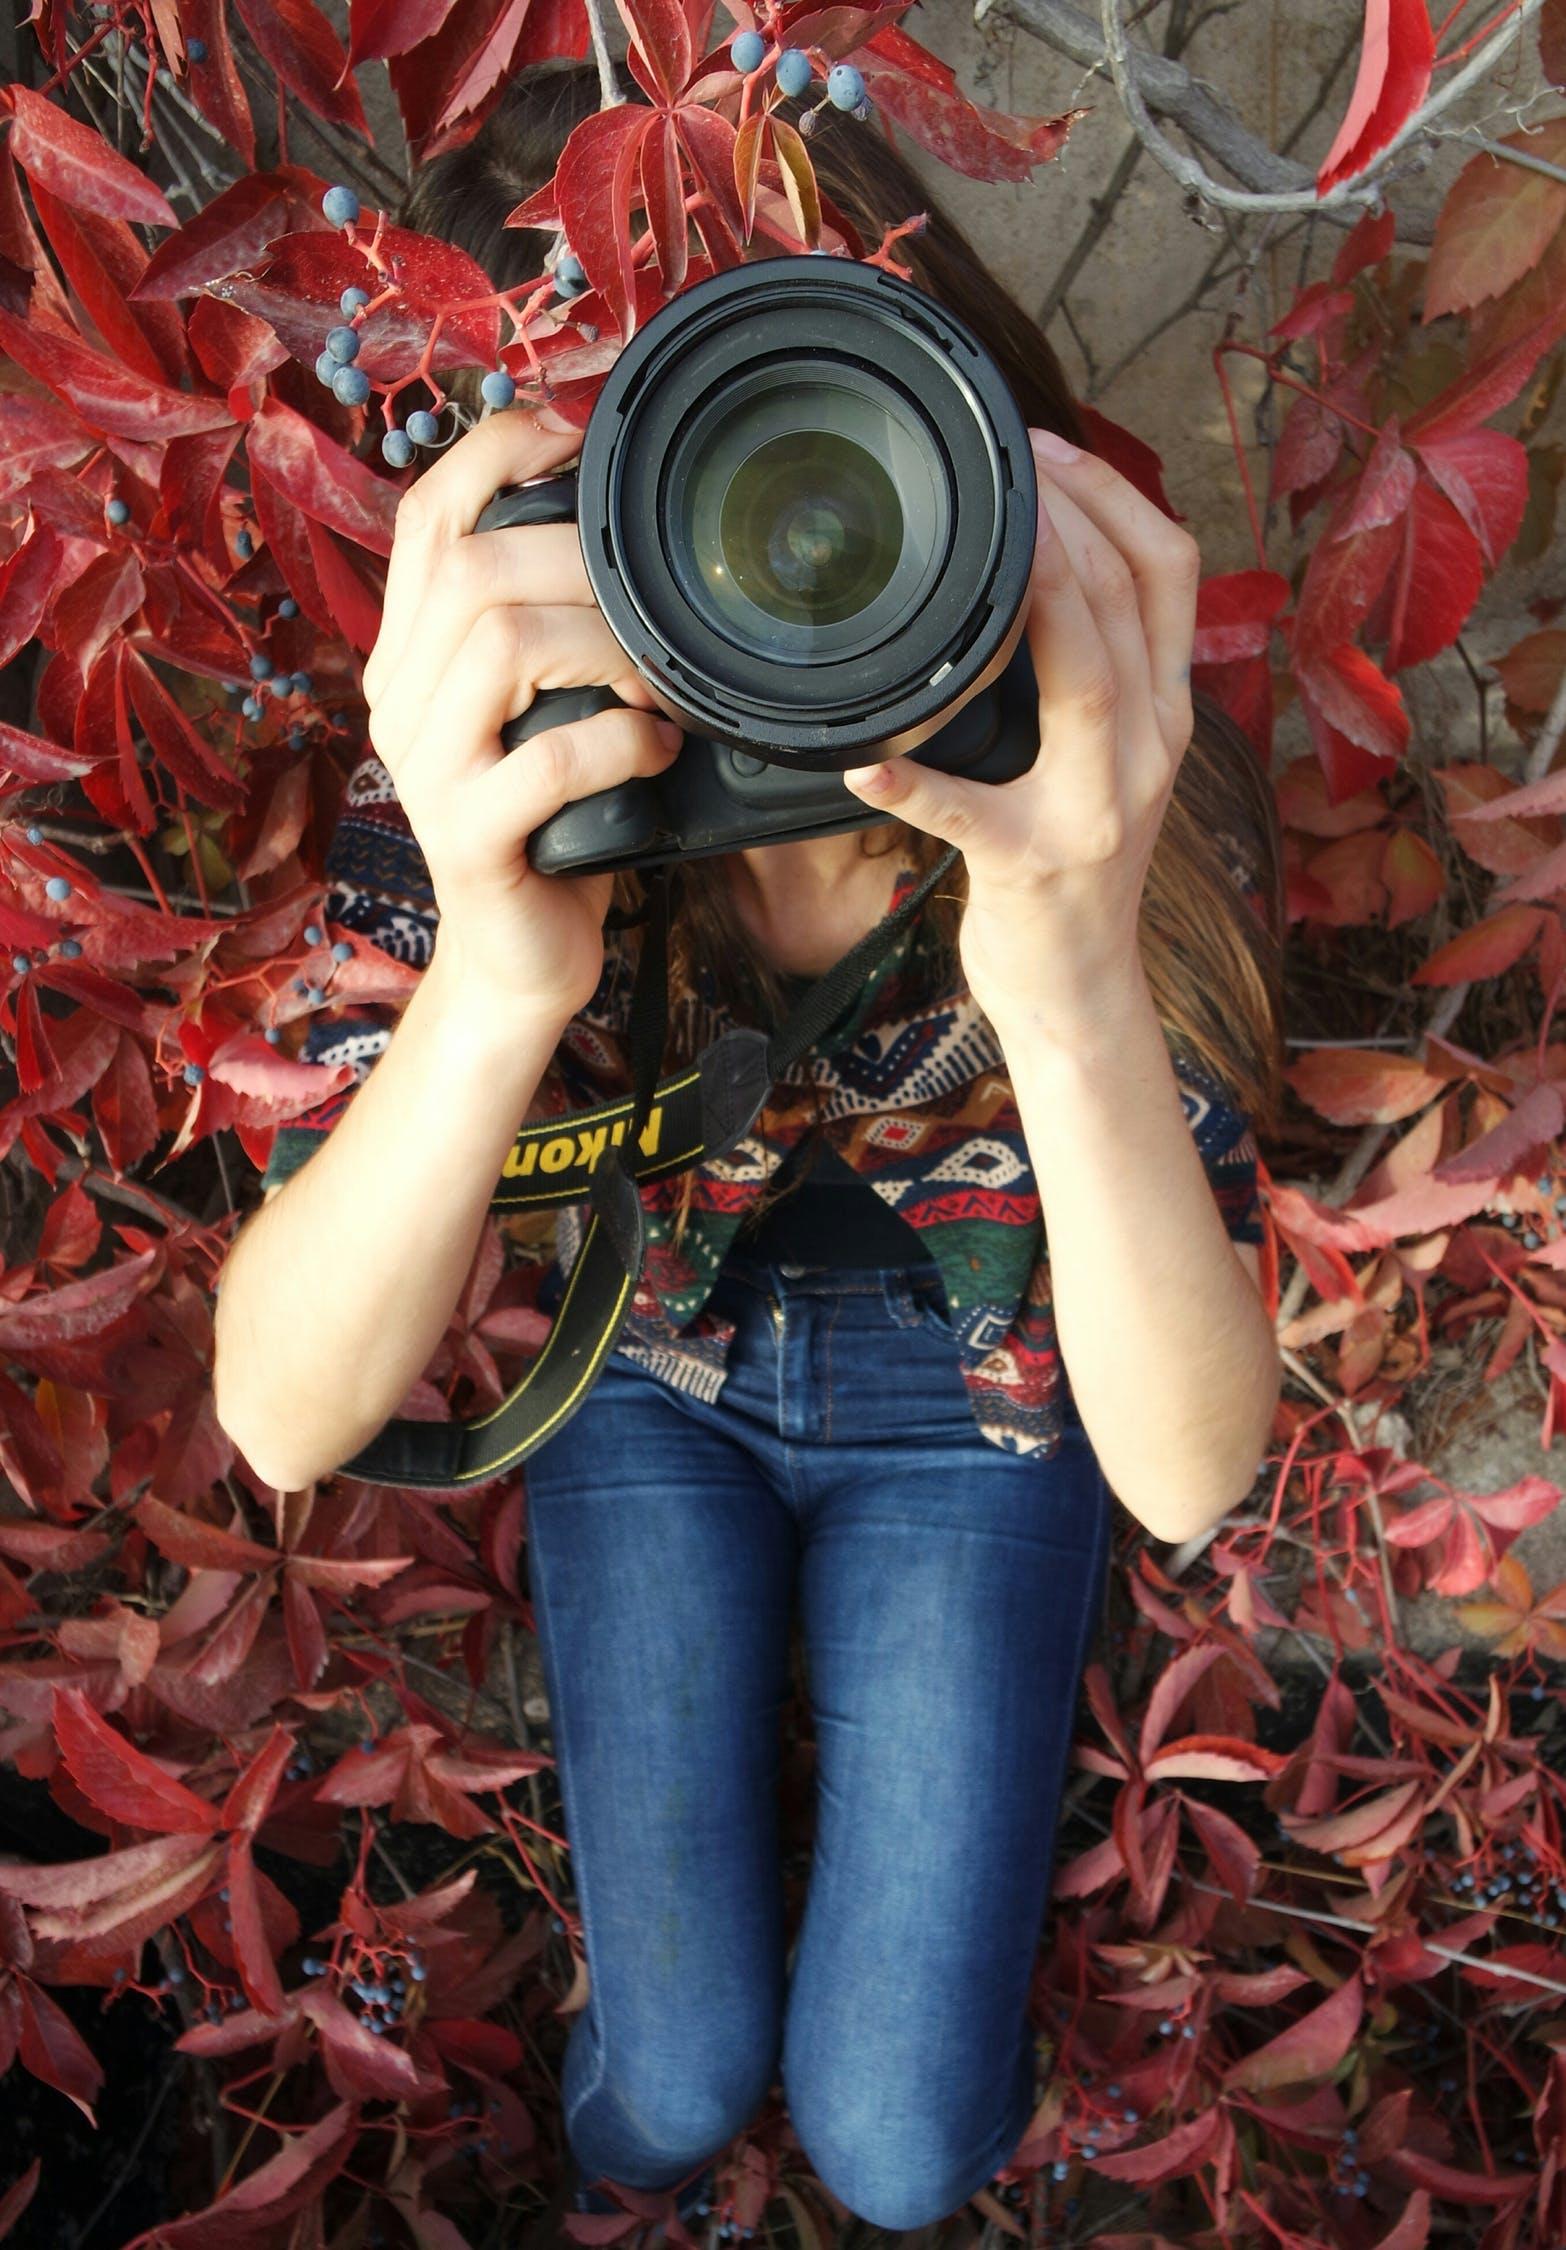 دوربین مدیوم فرمت یا قطع متوسط